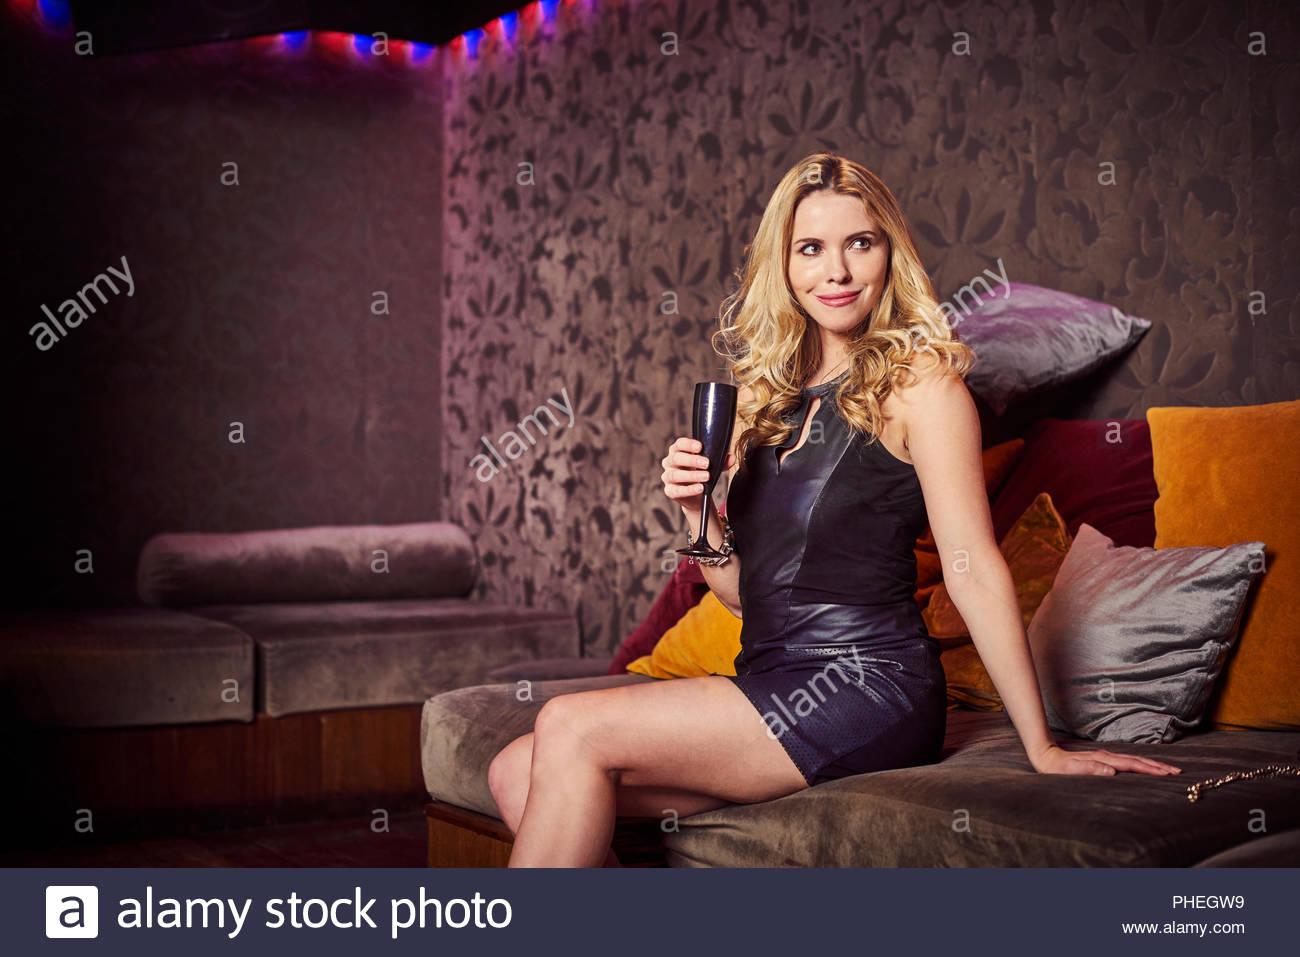 Young woman sitting on sofa at nightclub Stock Photo